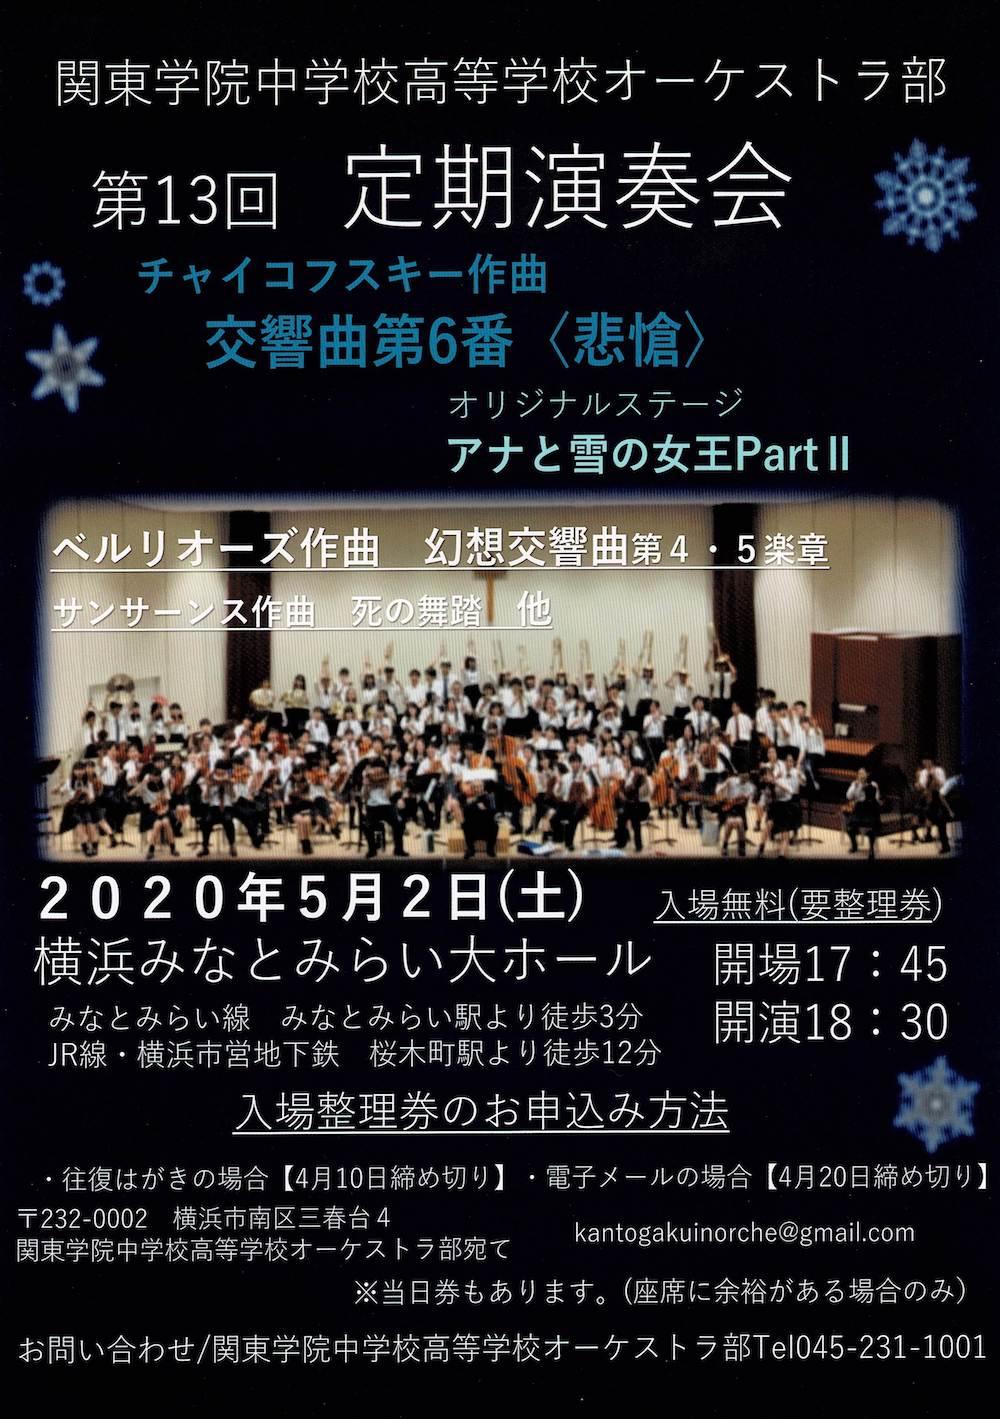 関東学院中高オーケストラ部定期演奏会